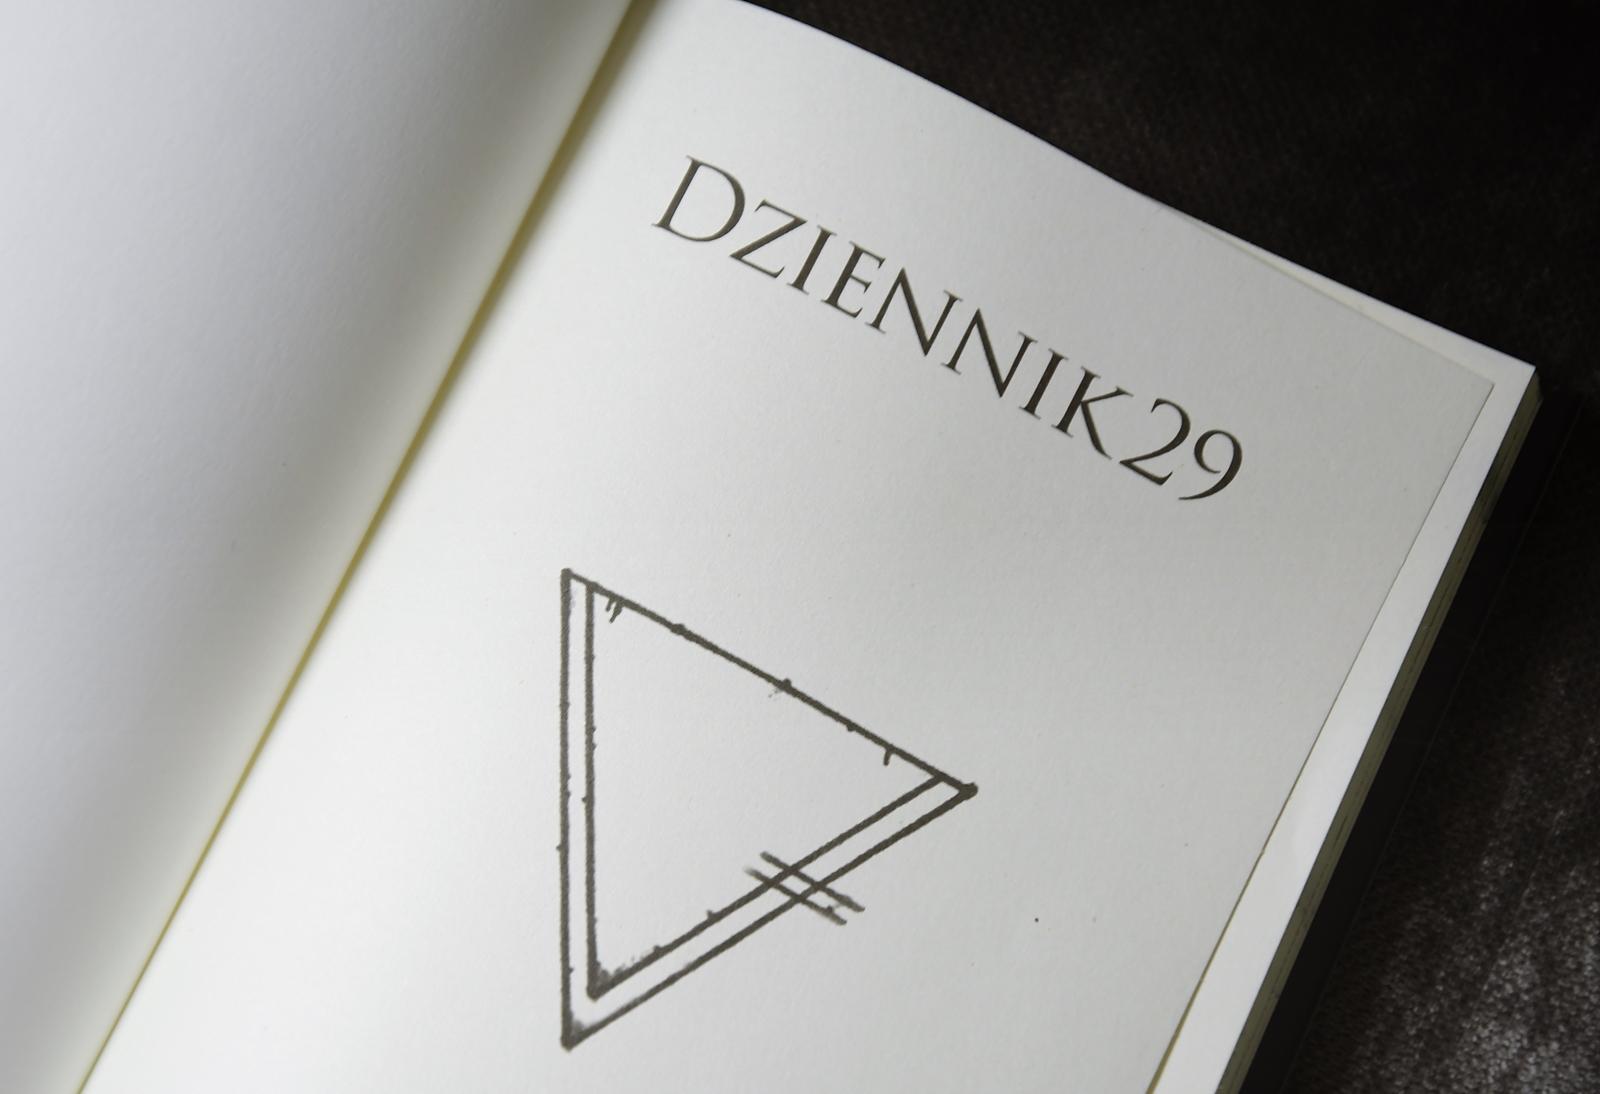 dziennik 29 recenzja